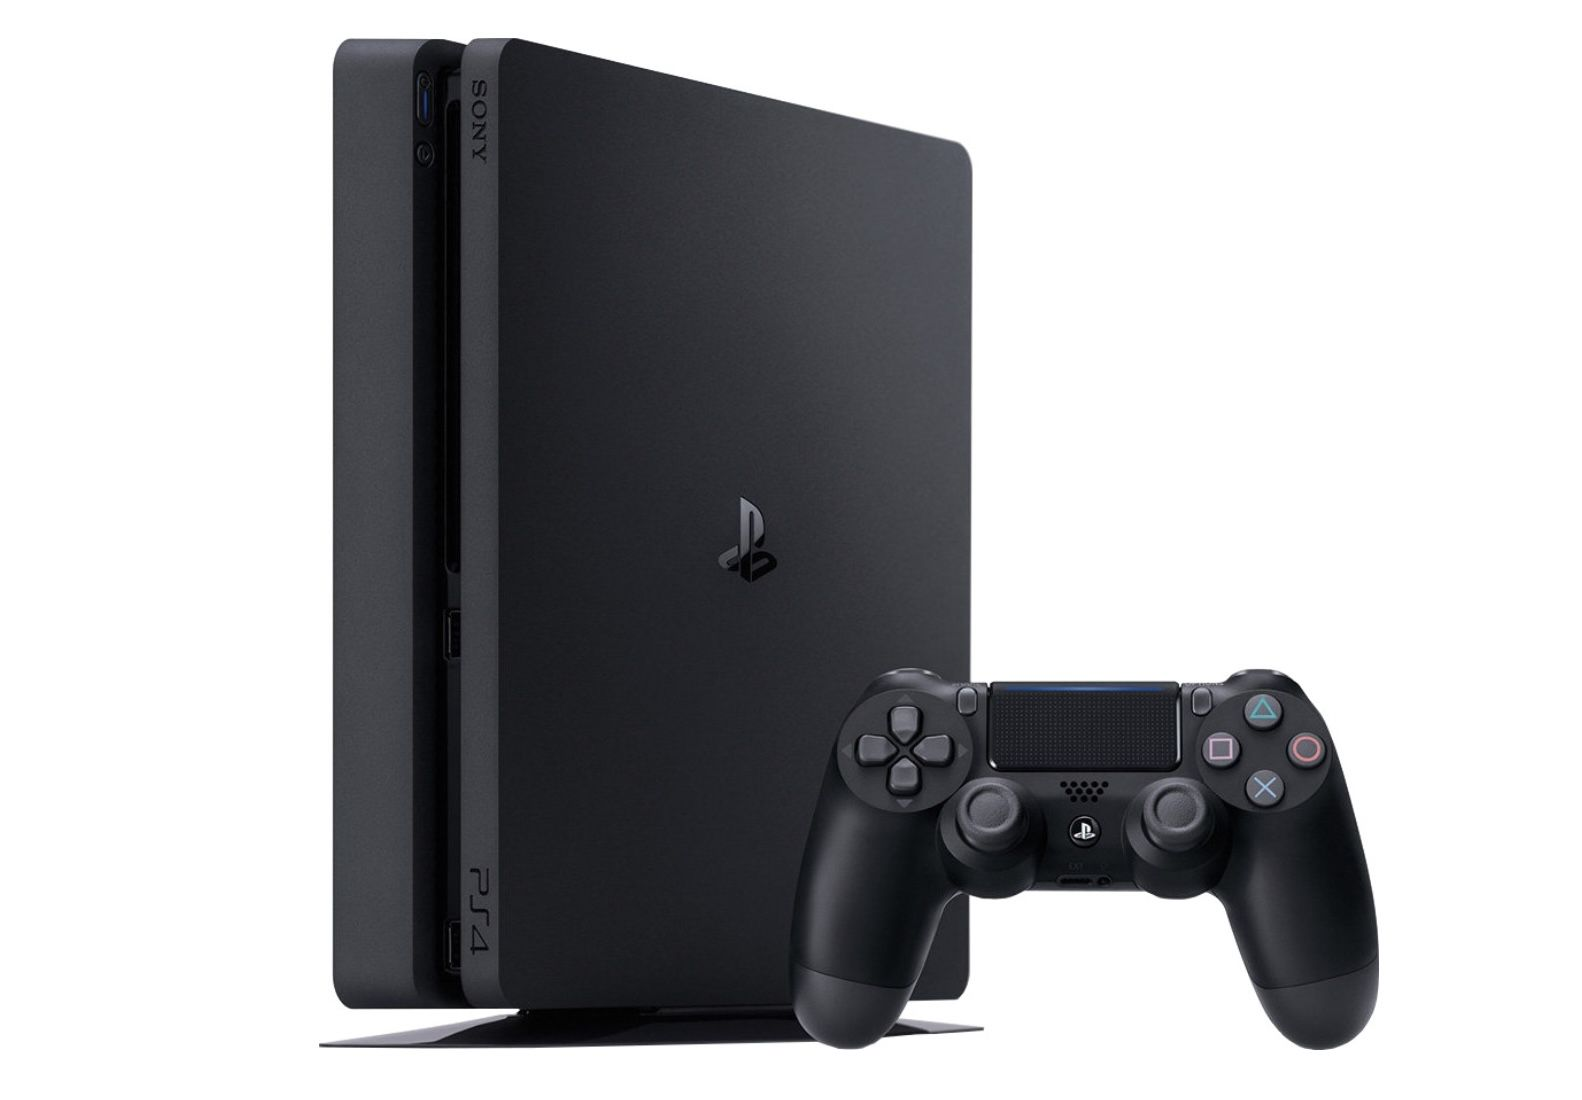 Info: Update könnte Playstation 4 beschädigen